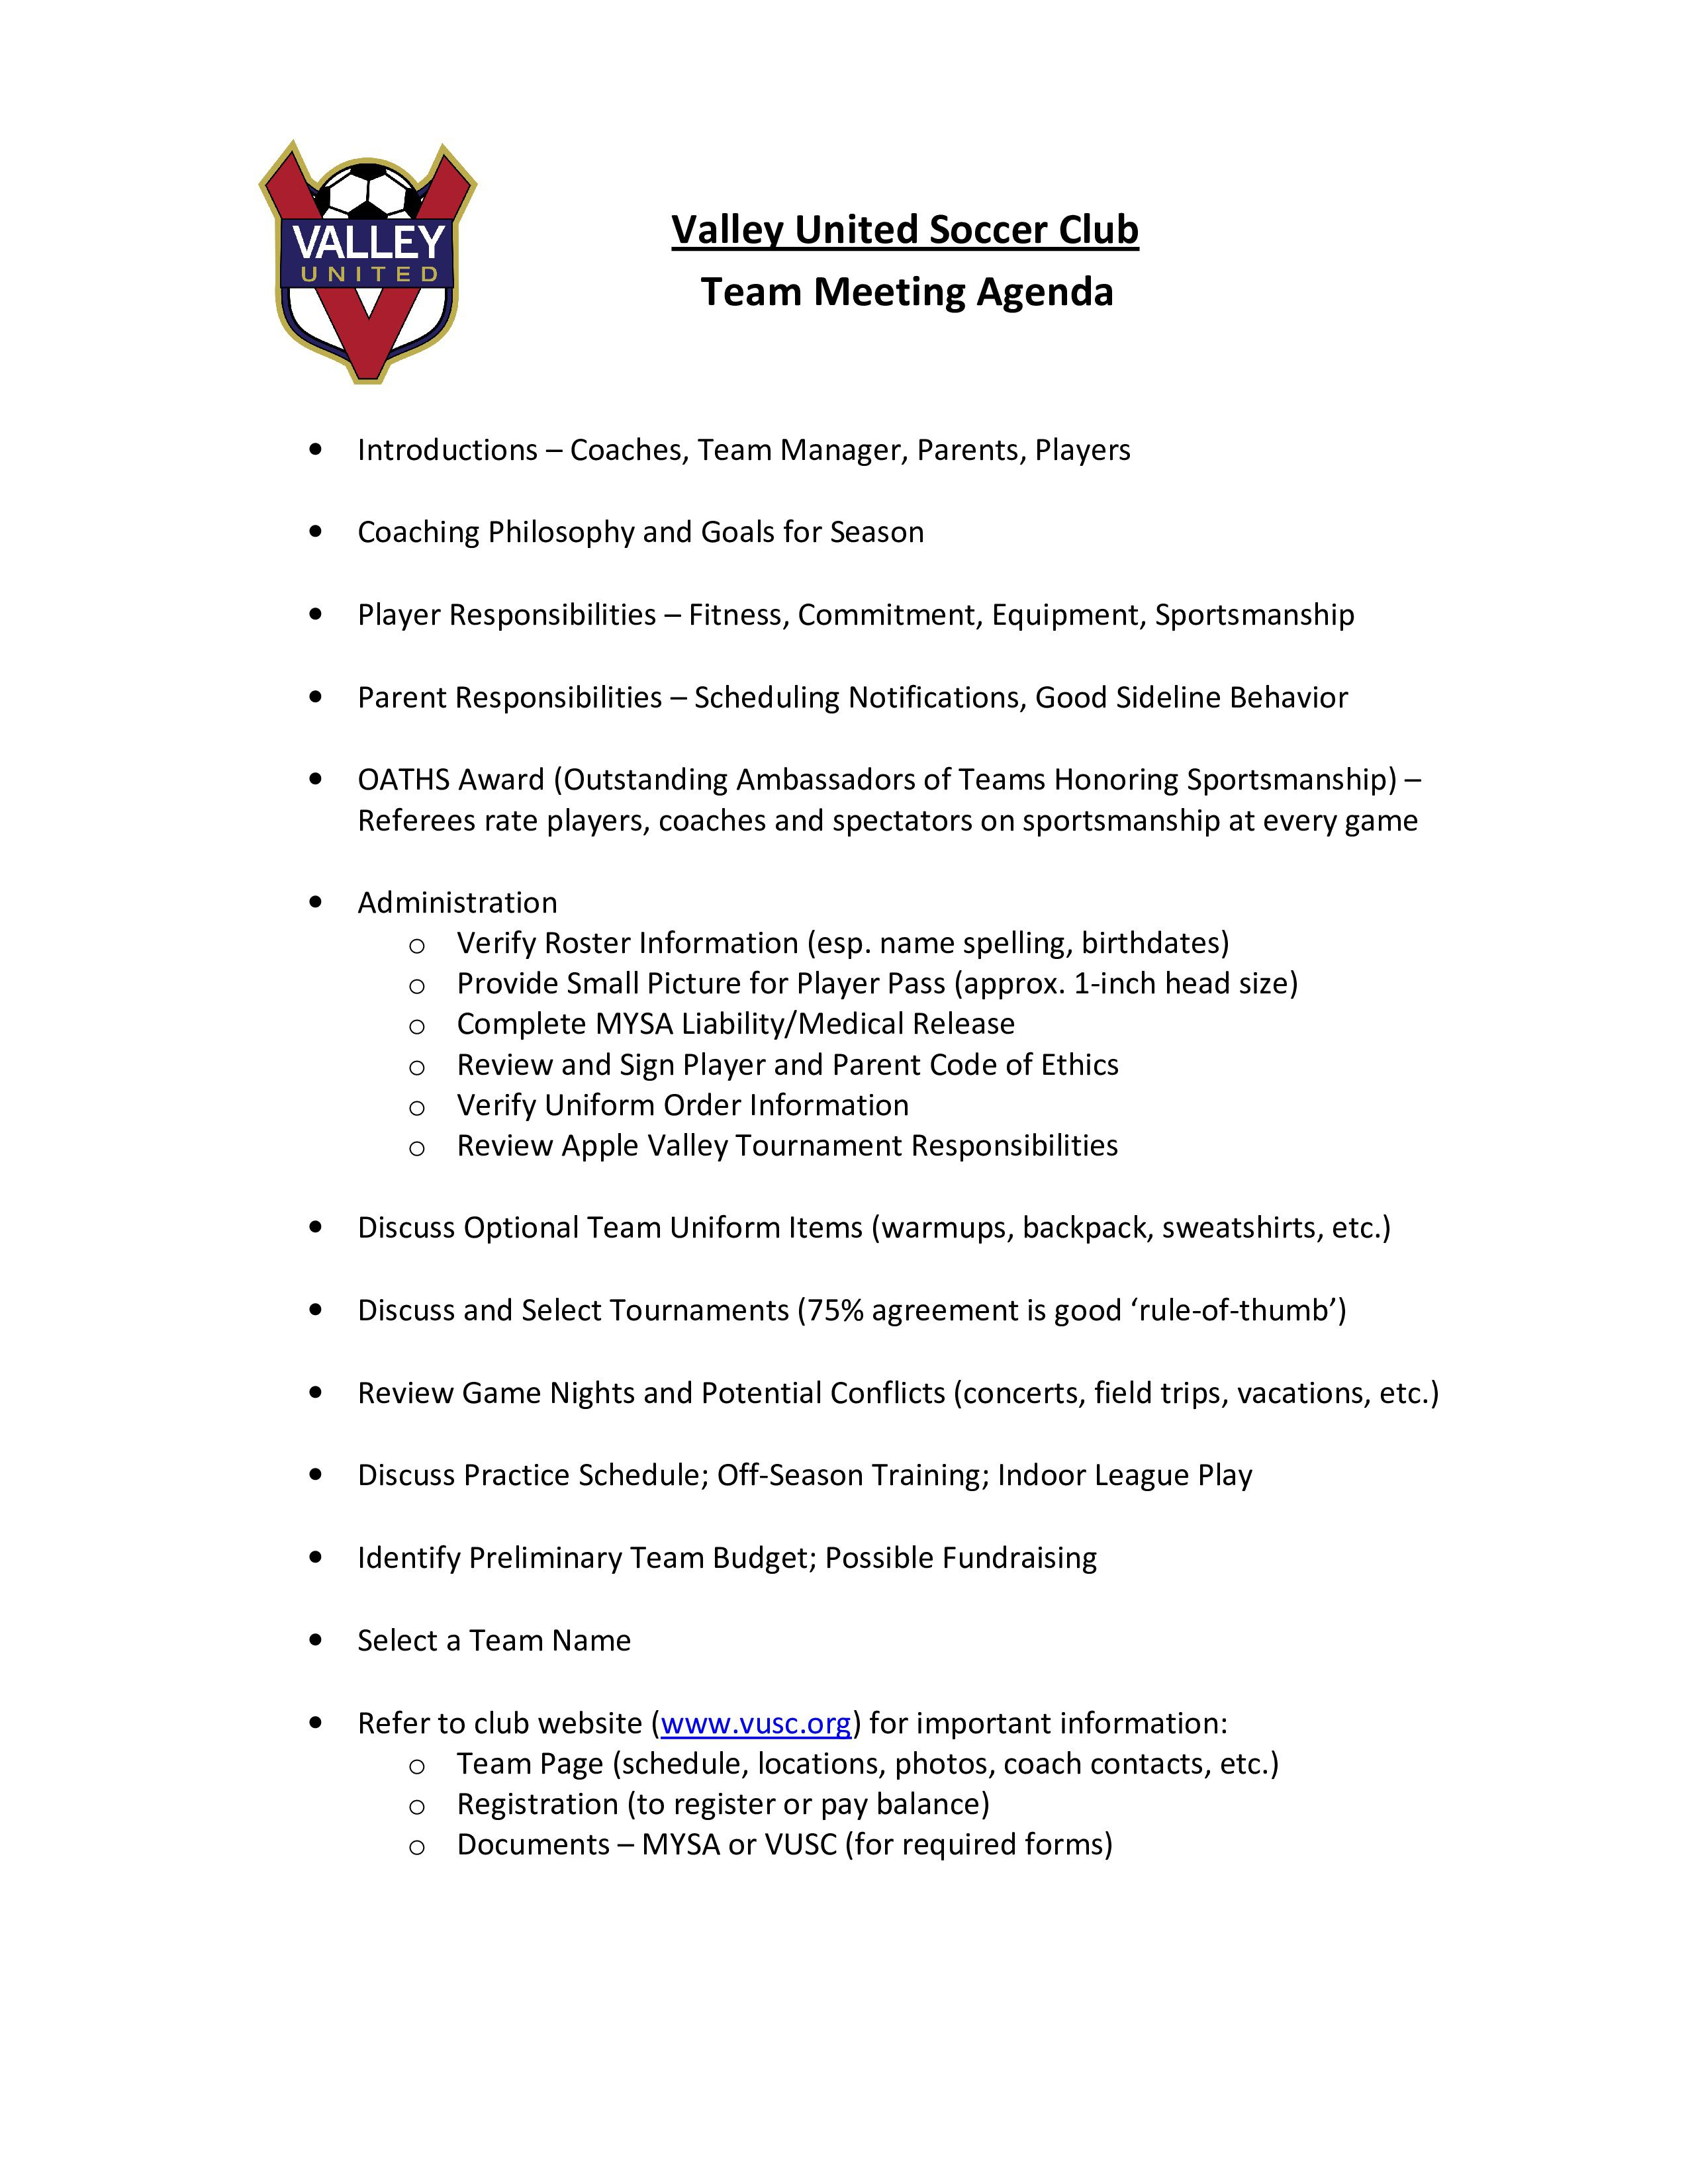 001 Wonderful Formal Meeting Agenda Template High Resolution  Board Example PdfFull